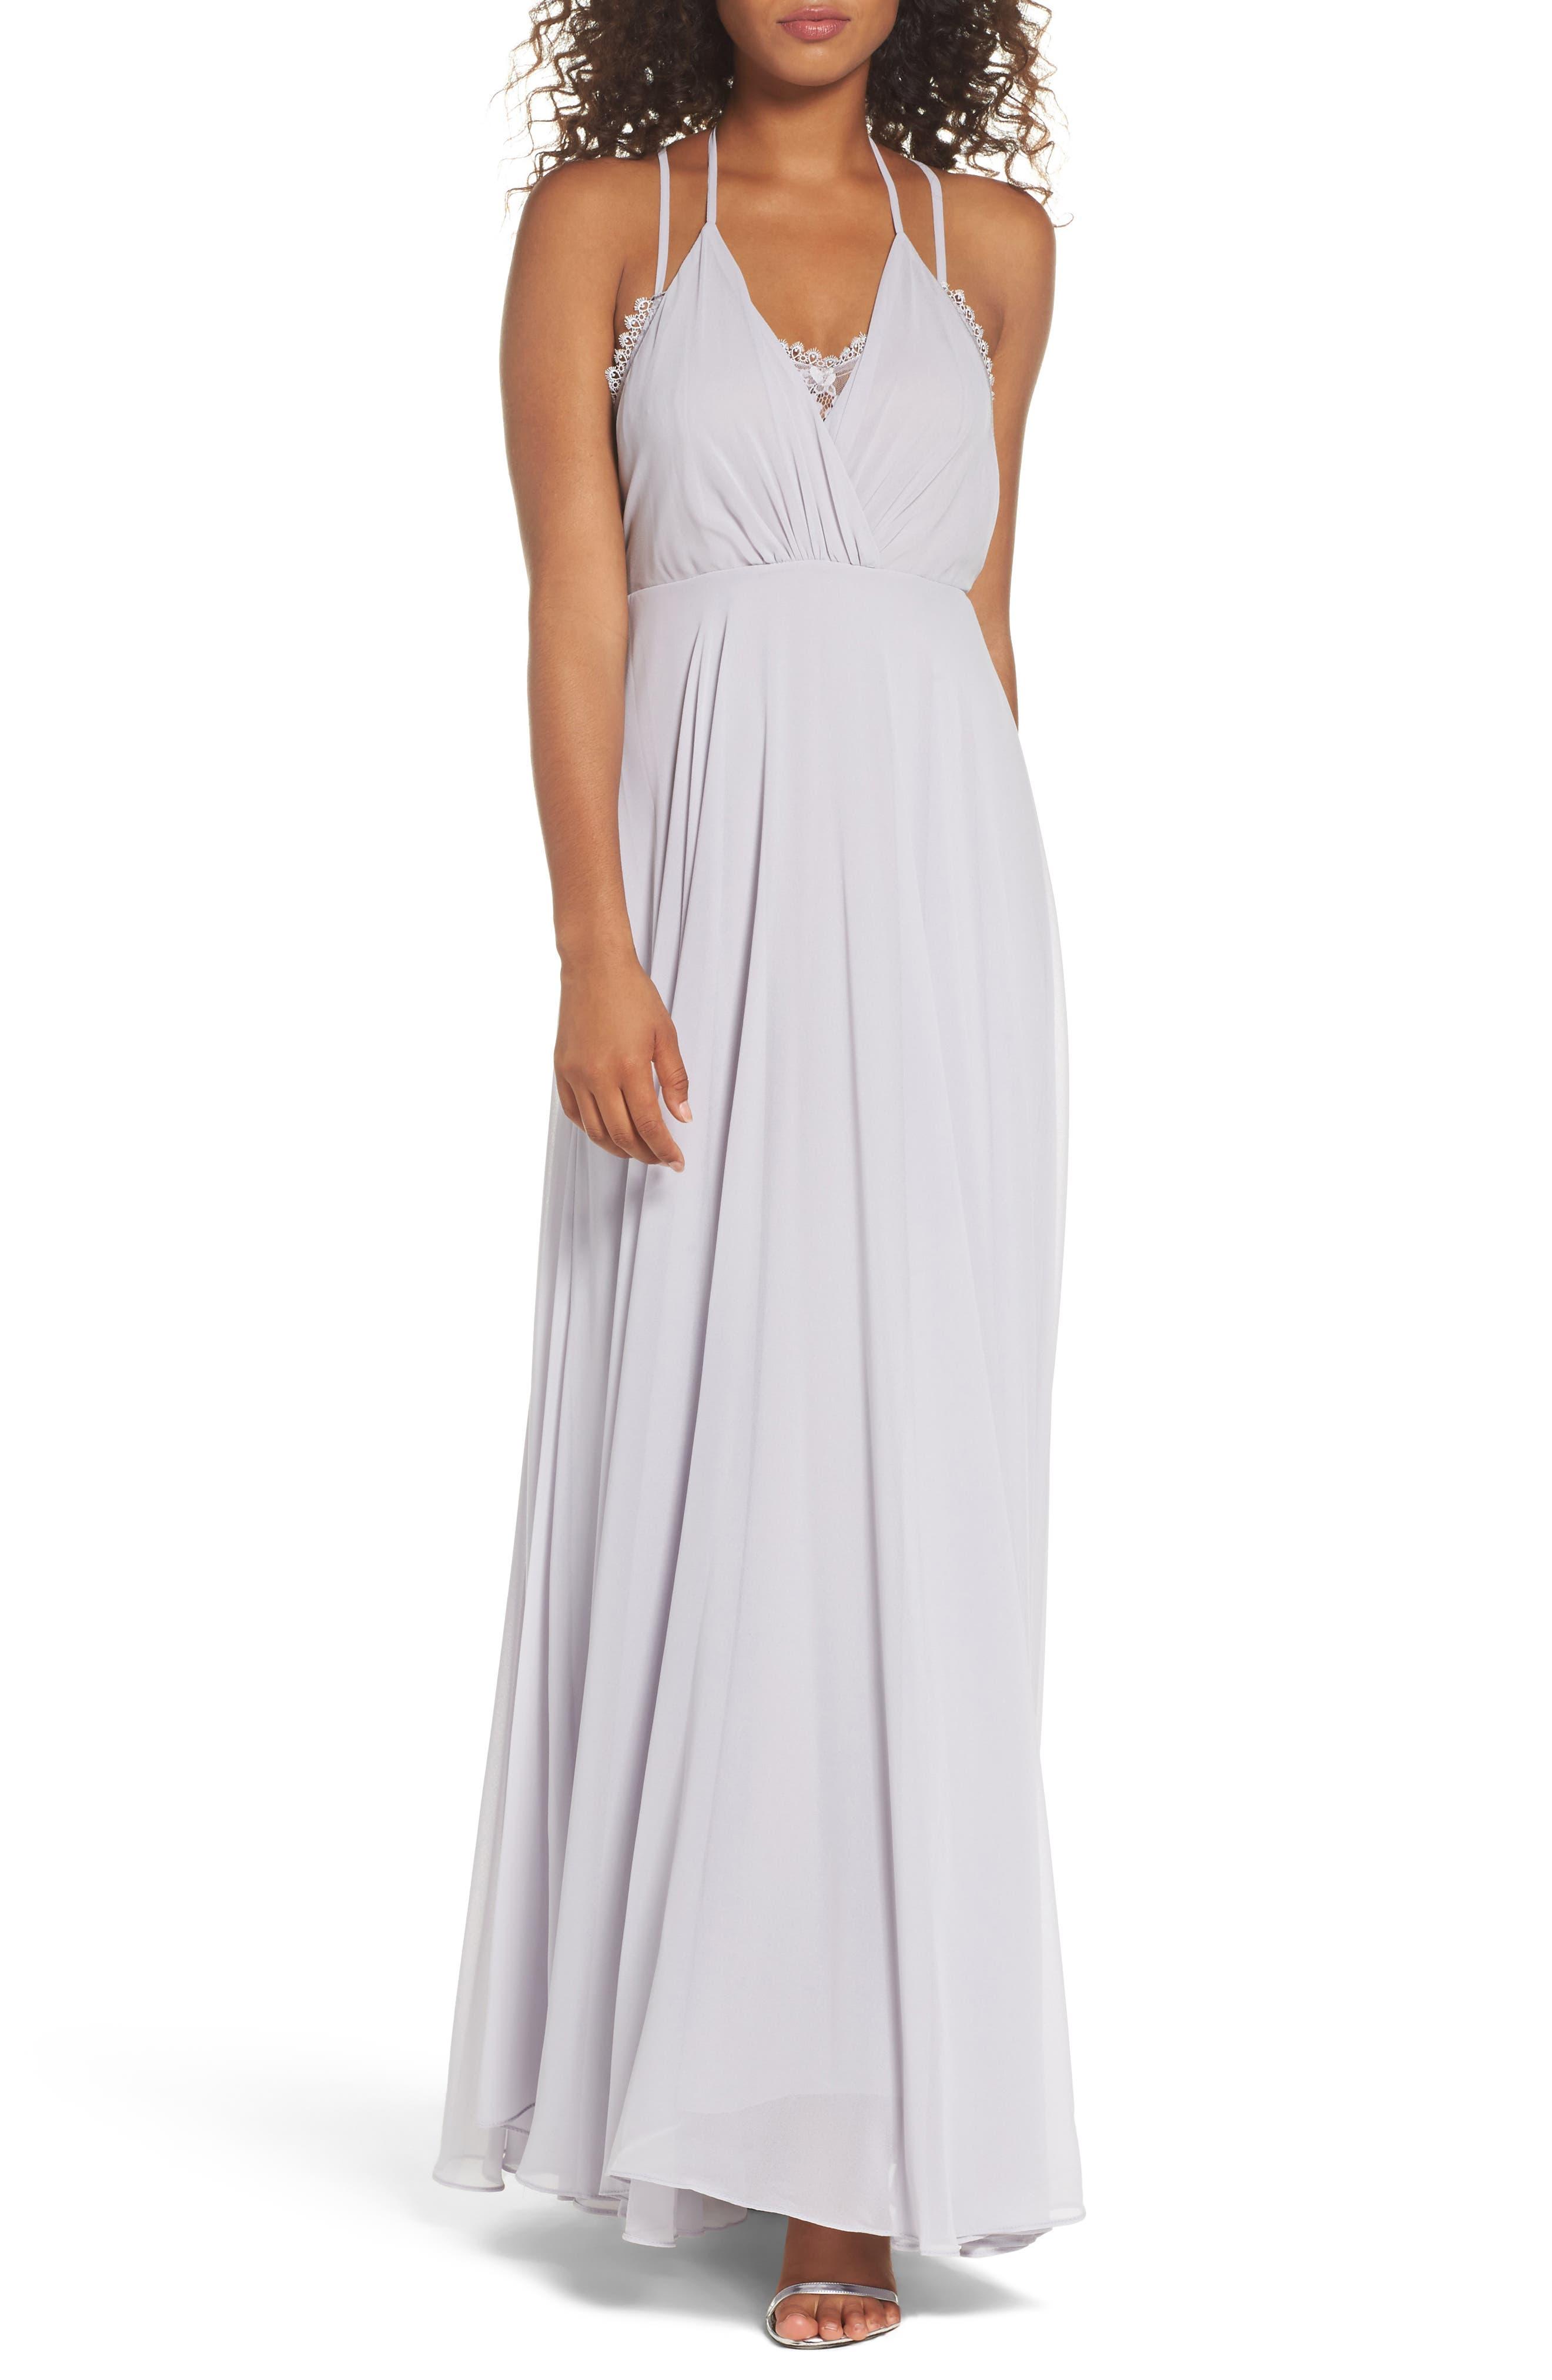 Celebrate the Moment Lace Trim Chiffon Maxi Dress,                         Main,                         color, 020